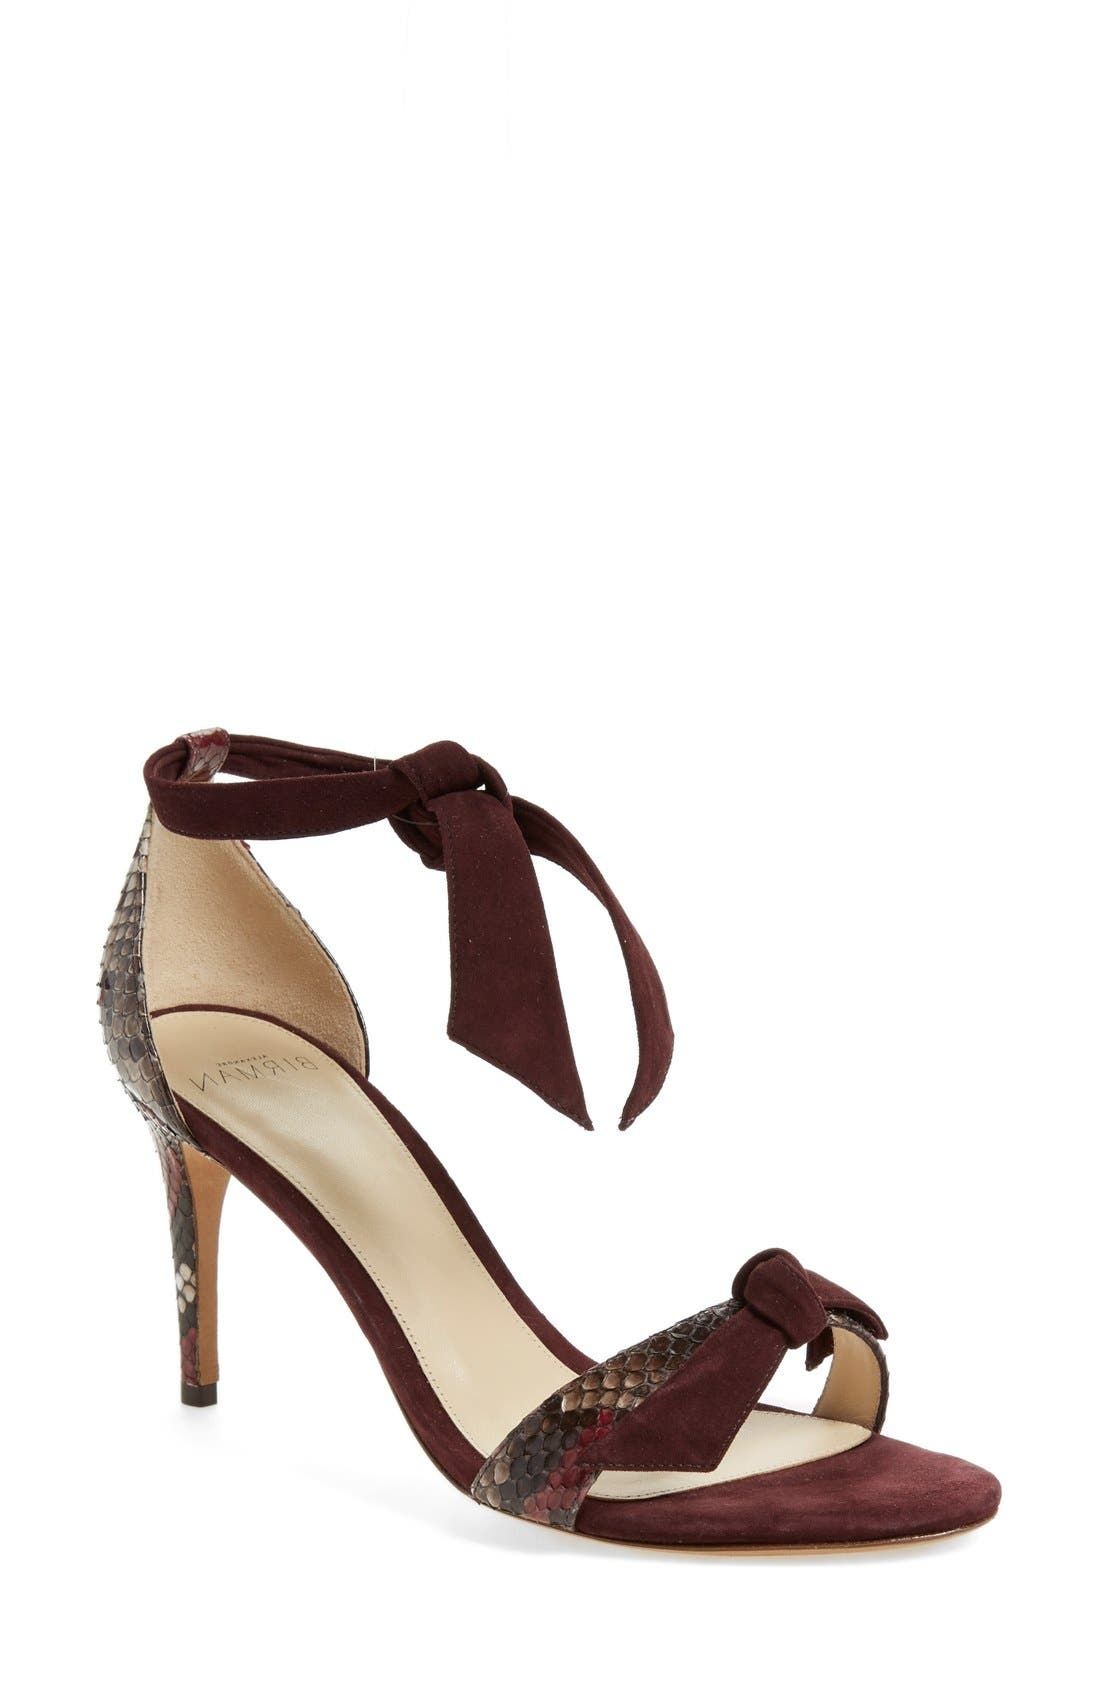 Alternate Image 1 Selected - Alexandre Birman 'Clarita' Suede & Genuine Python Ankle Tie Sandal (Women) (Nordstrom Exclusive)